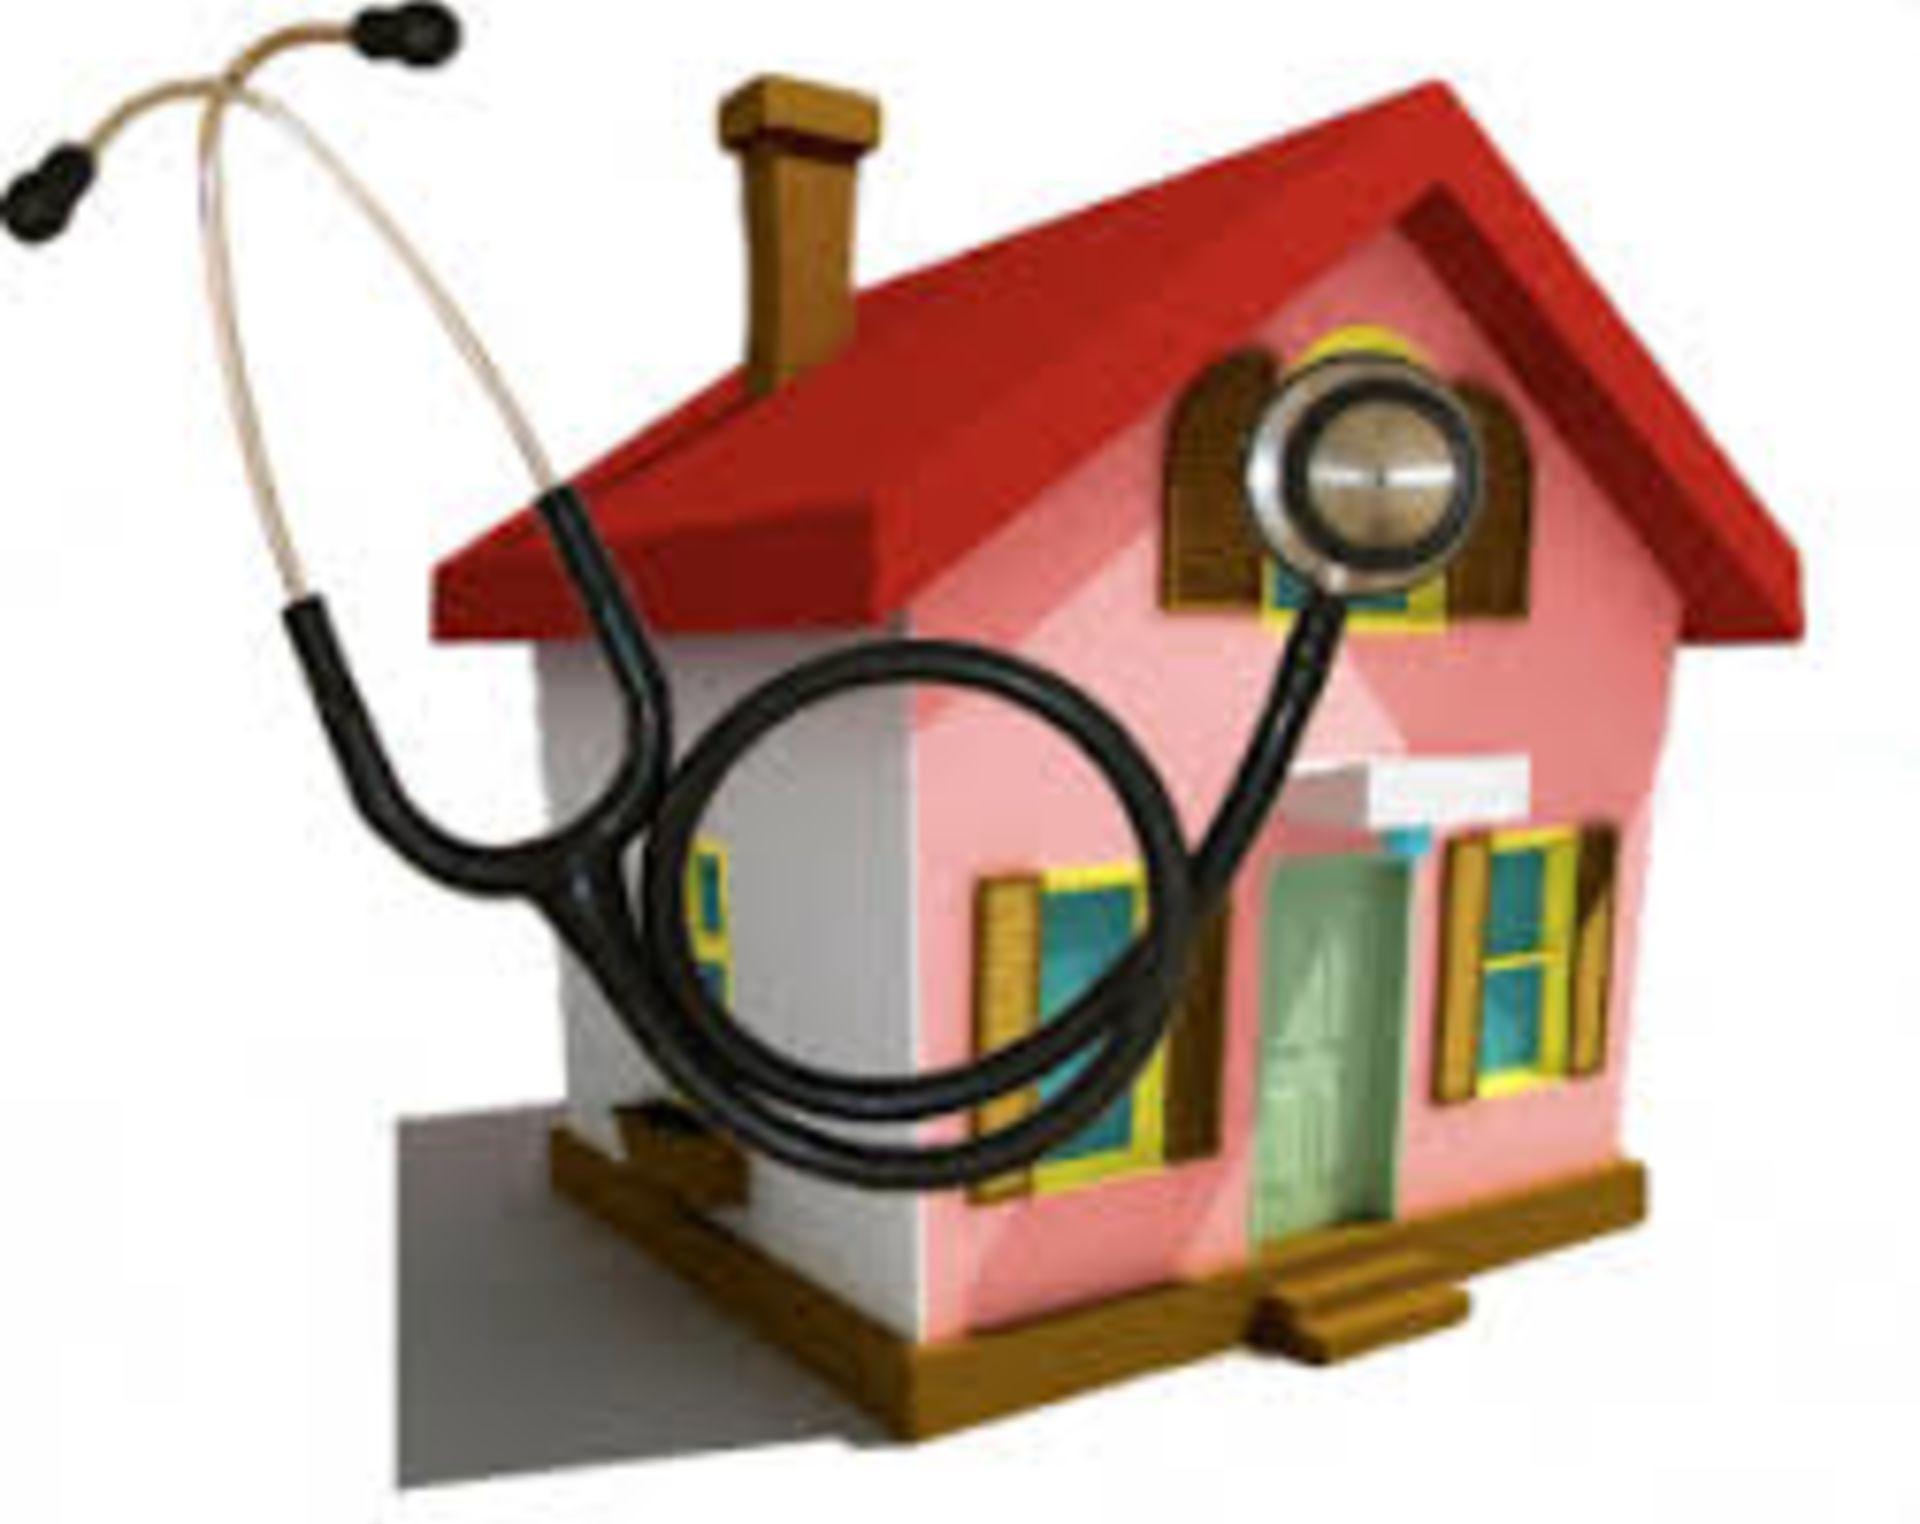 Steps to a Healthier Home